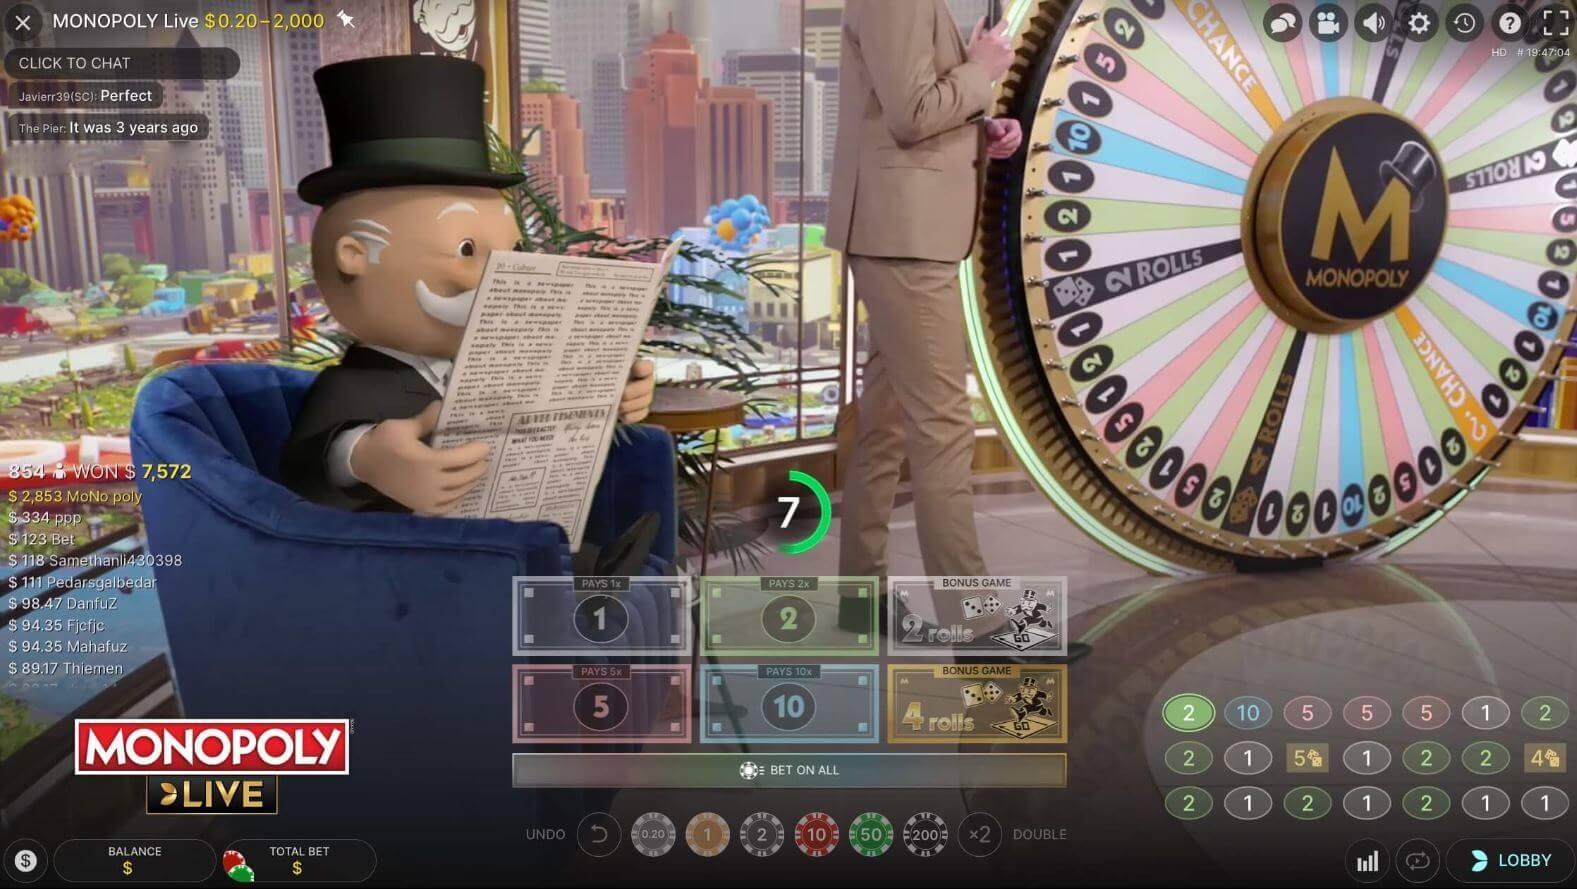 Monopoly Live hoe speel je monopoly live